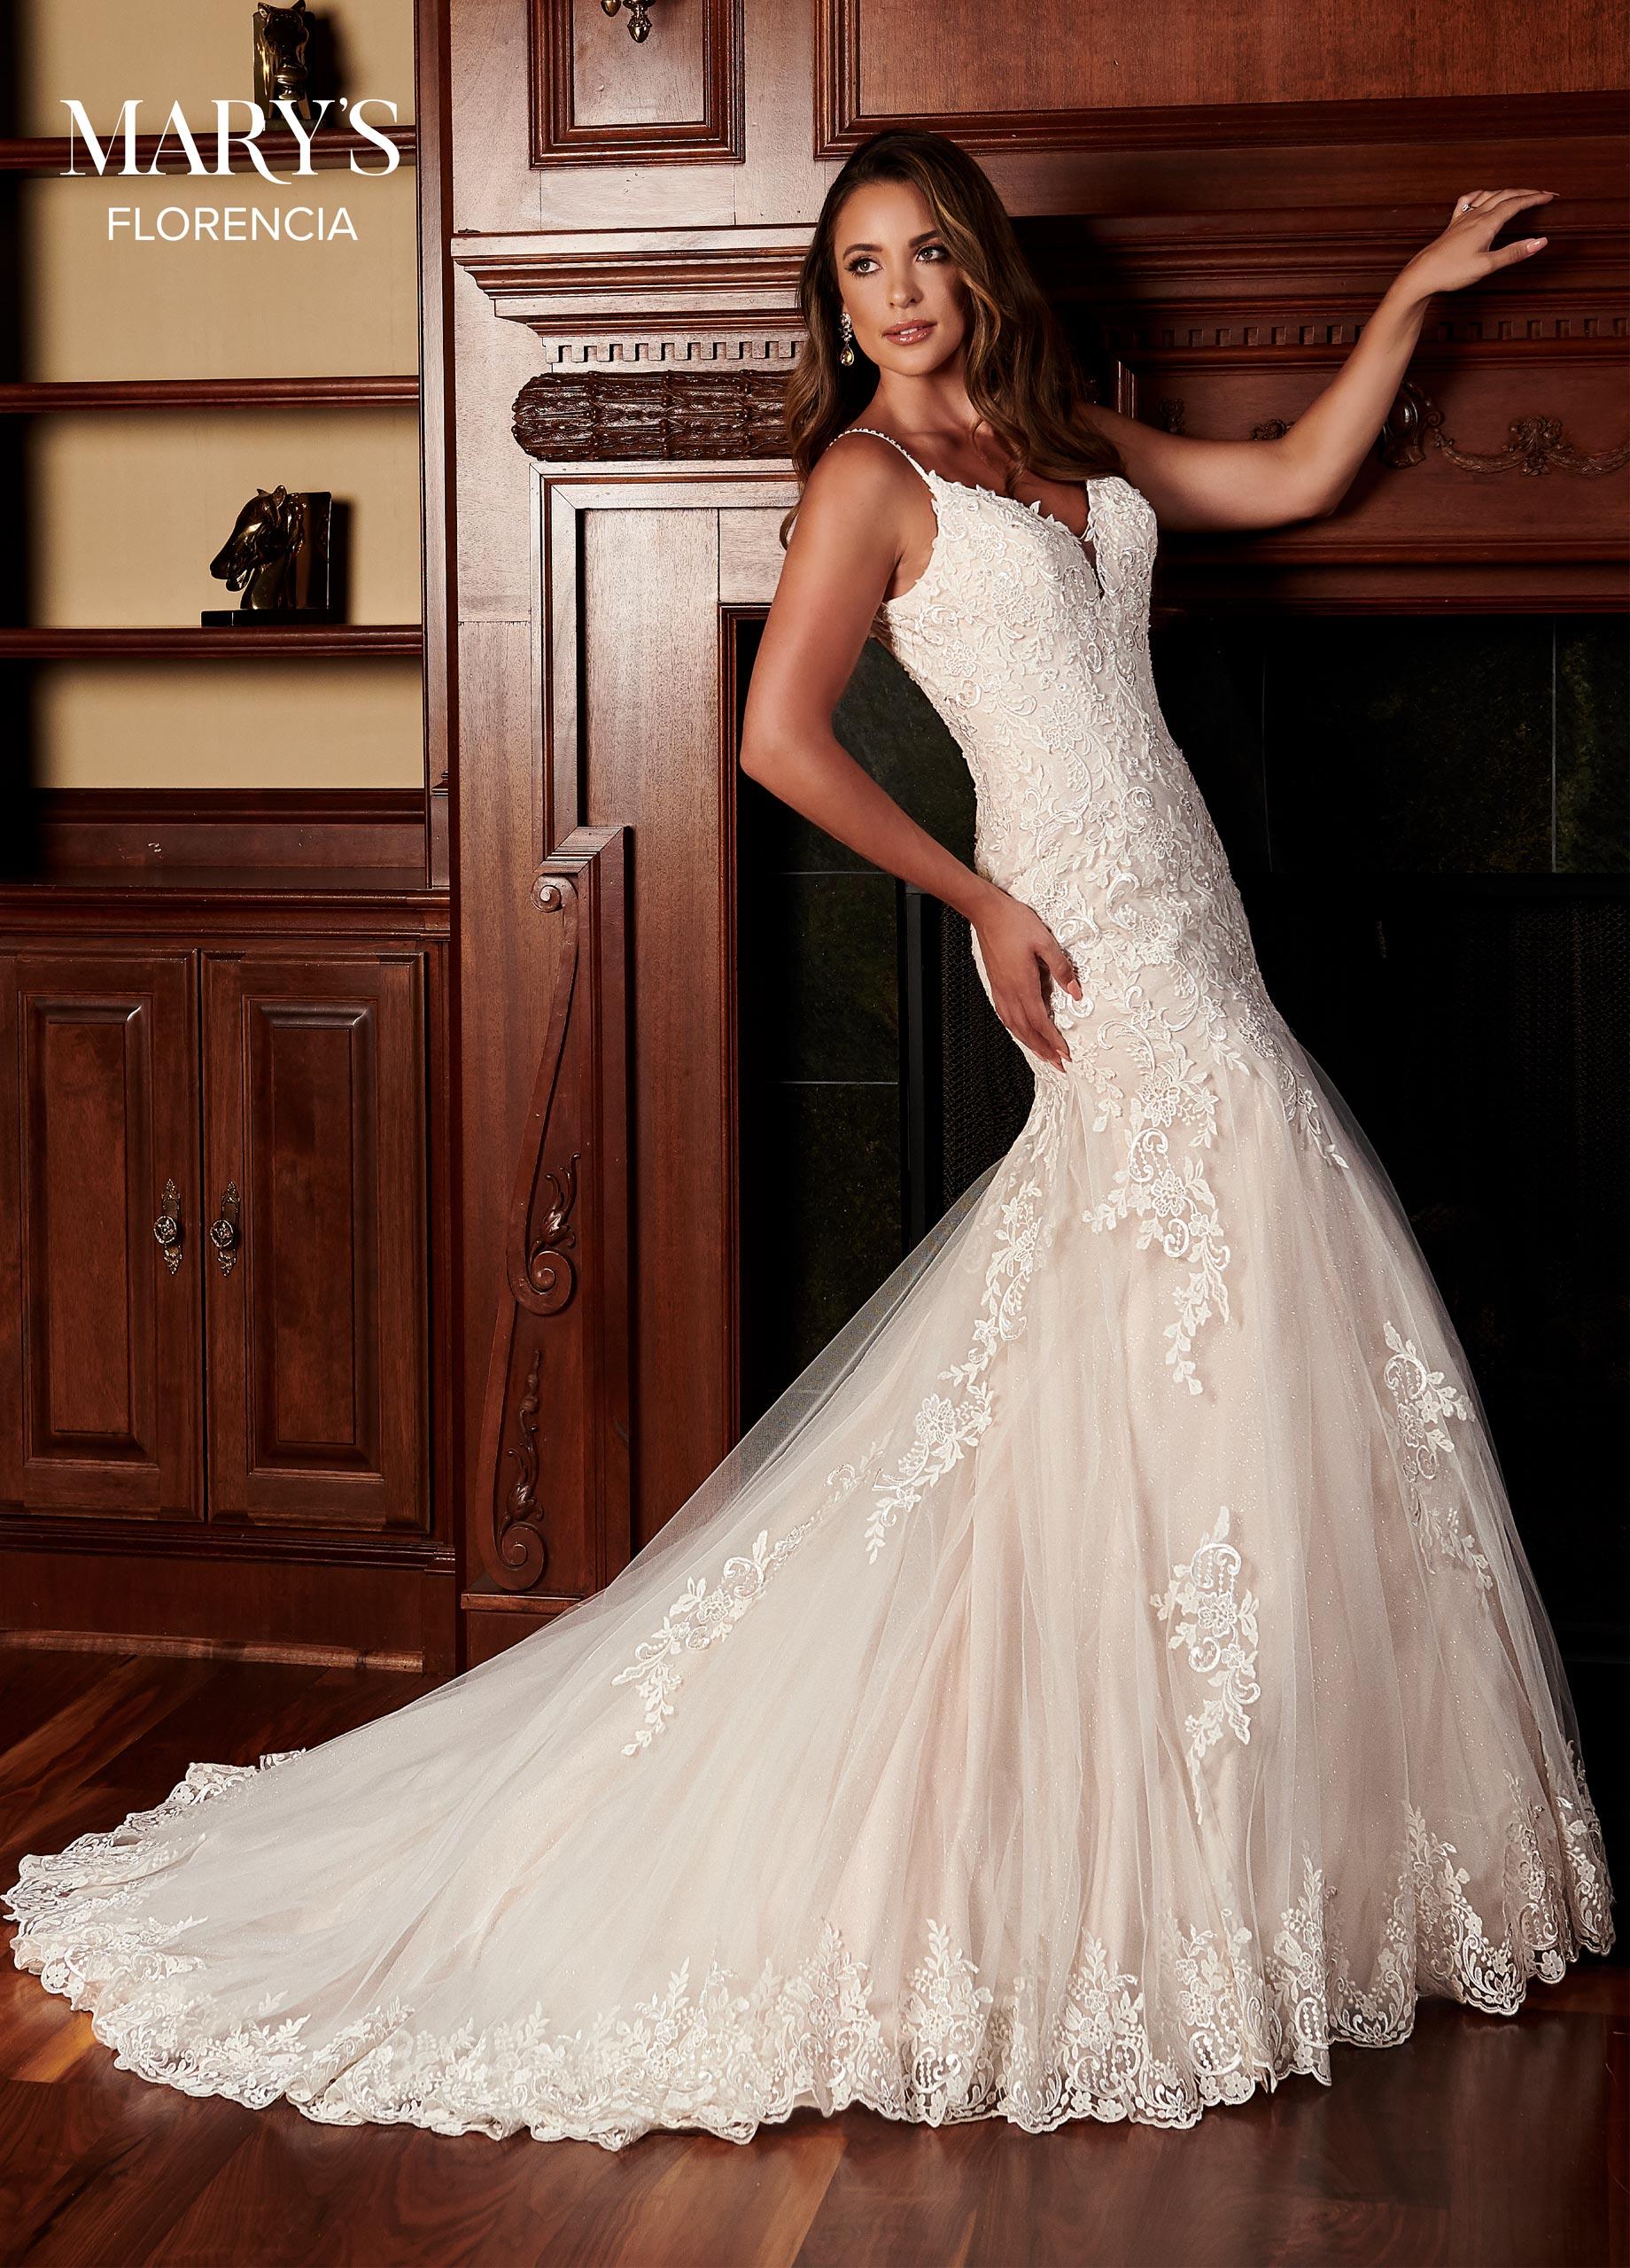 Scoop Neck Mermaid Bridal Dresses in Color   Style - M783